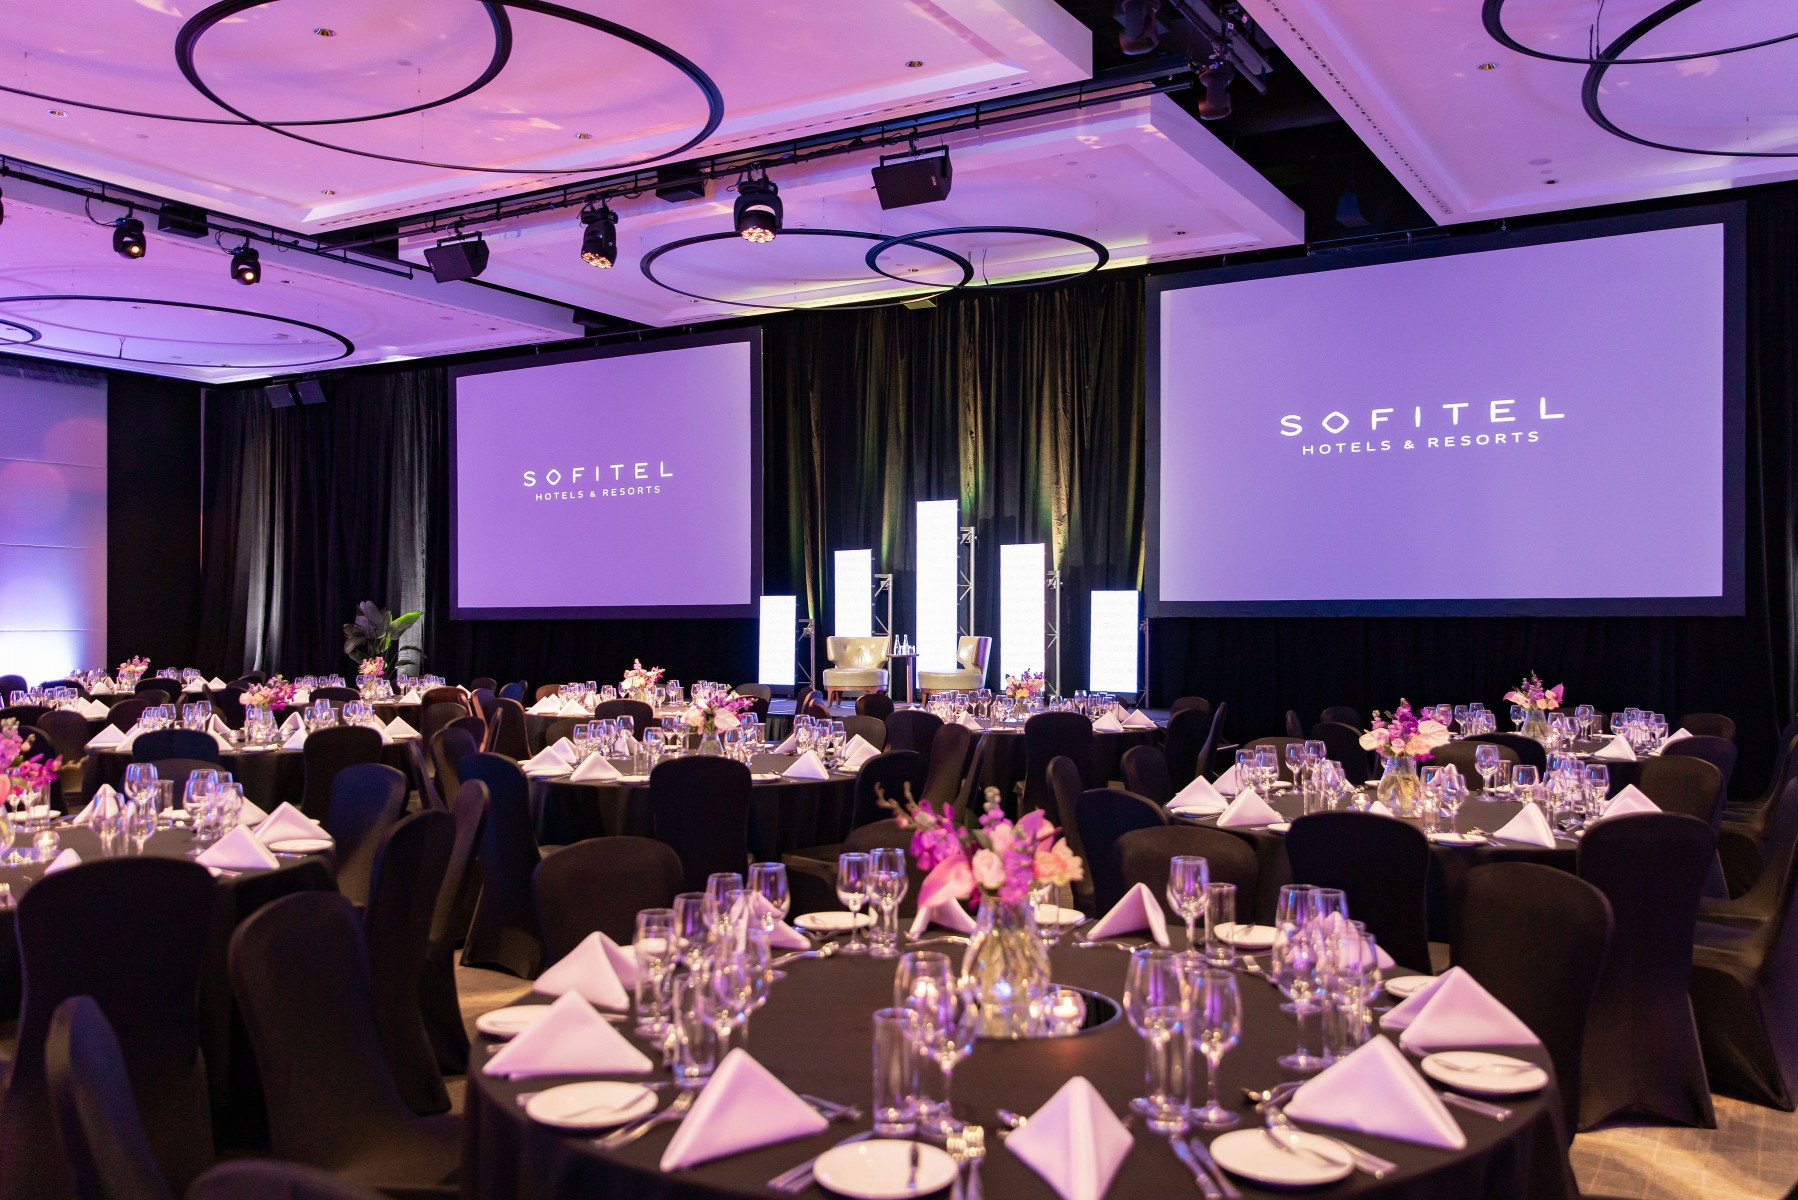 Sofitel-Sydney-Darling-Harbour-Ballroom-1.jpg